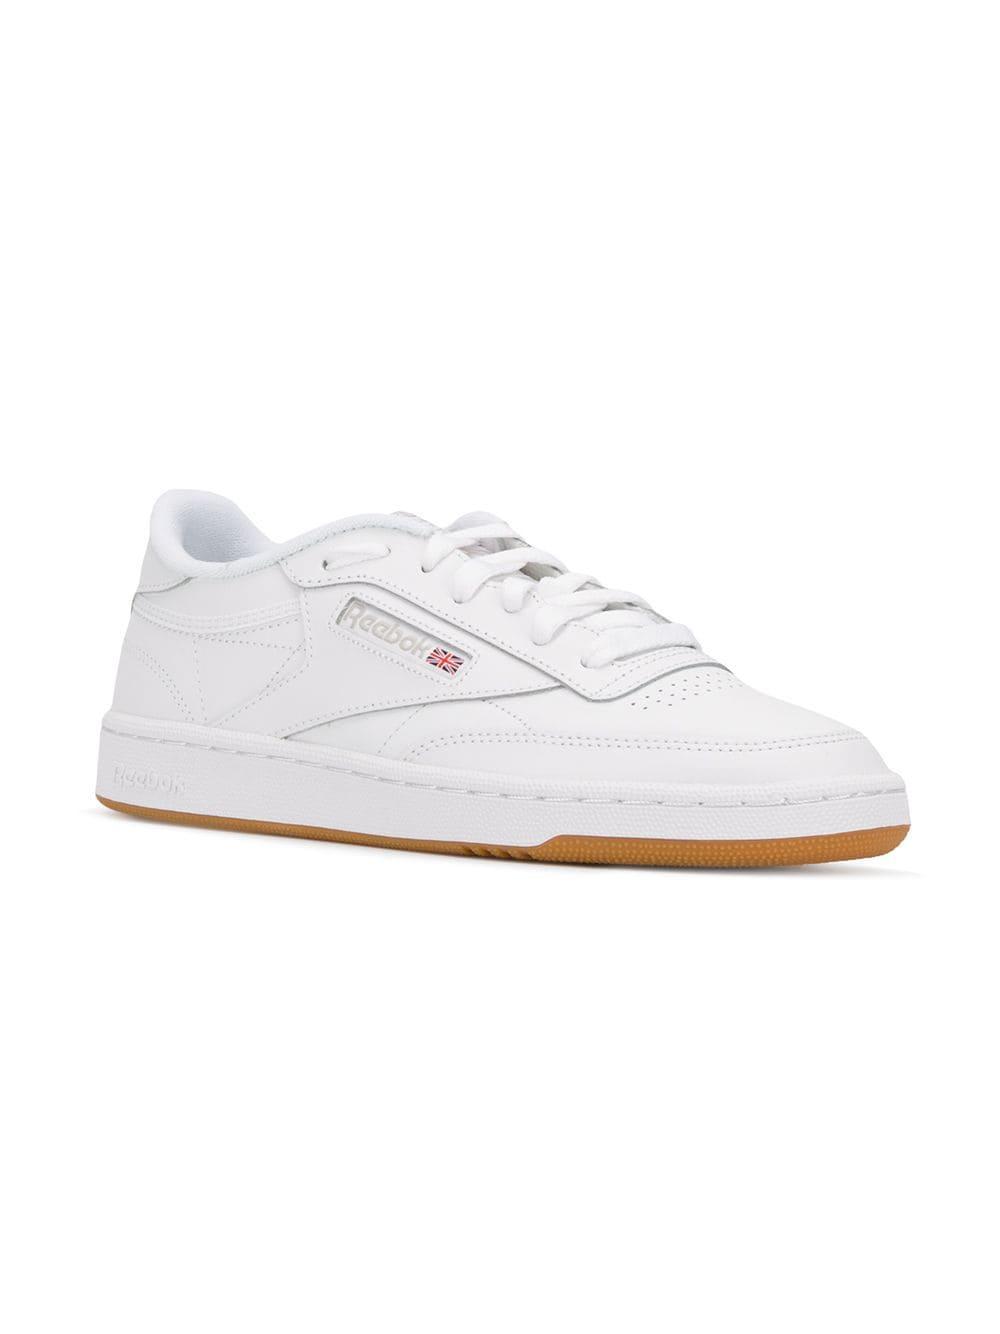 Reebok - White Club C 85 Sneakers for Men - Lyst. View fullscreen 13876c96f